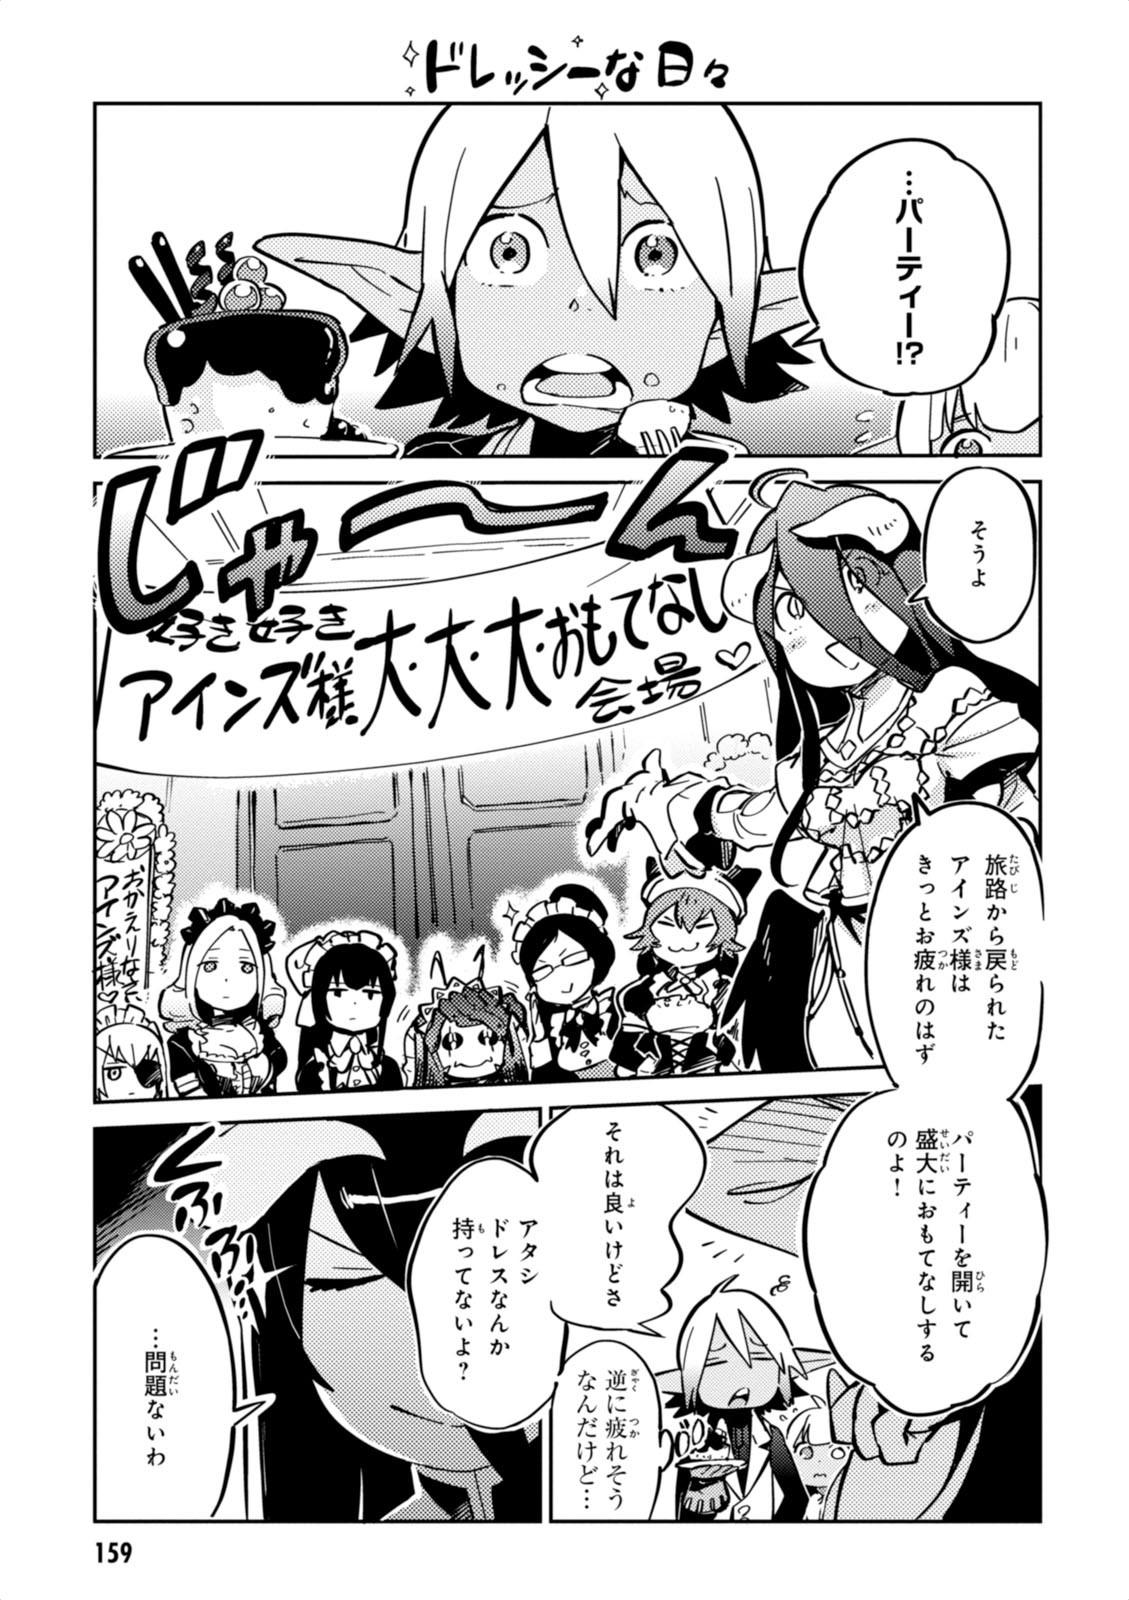 Overlord Blu-ray 03 Manga Special